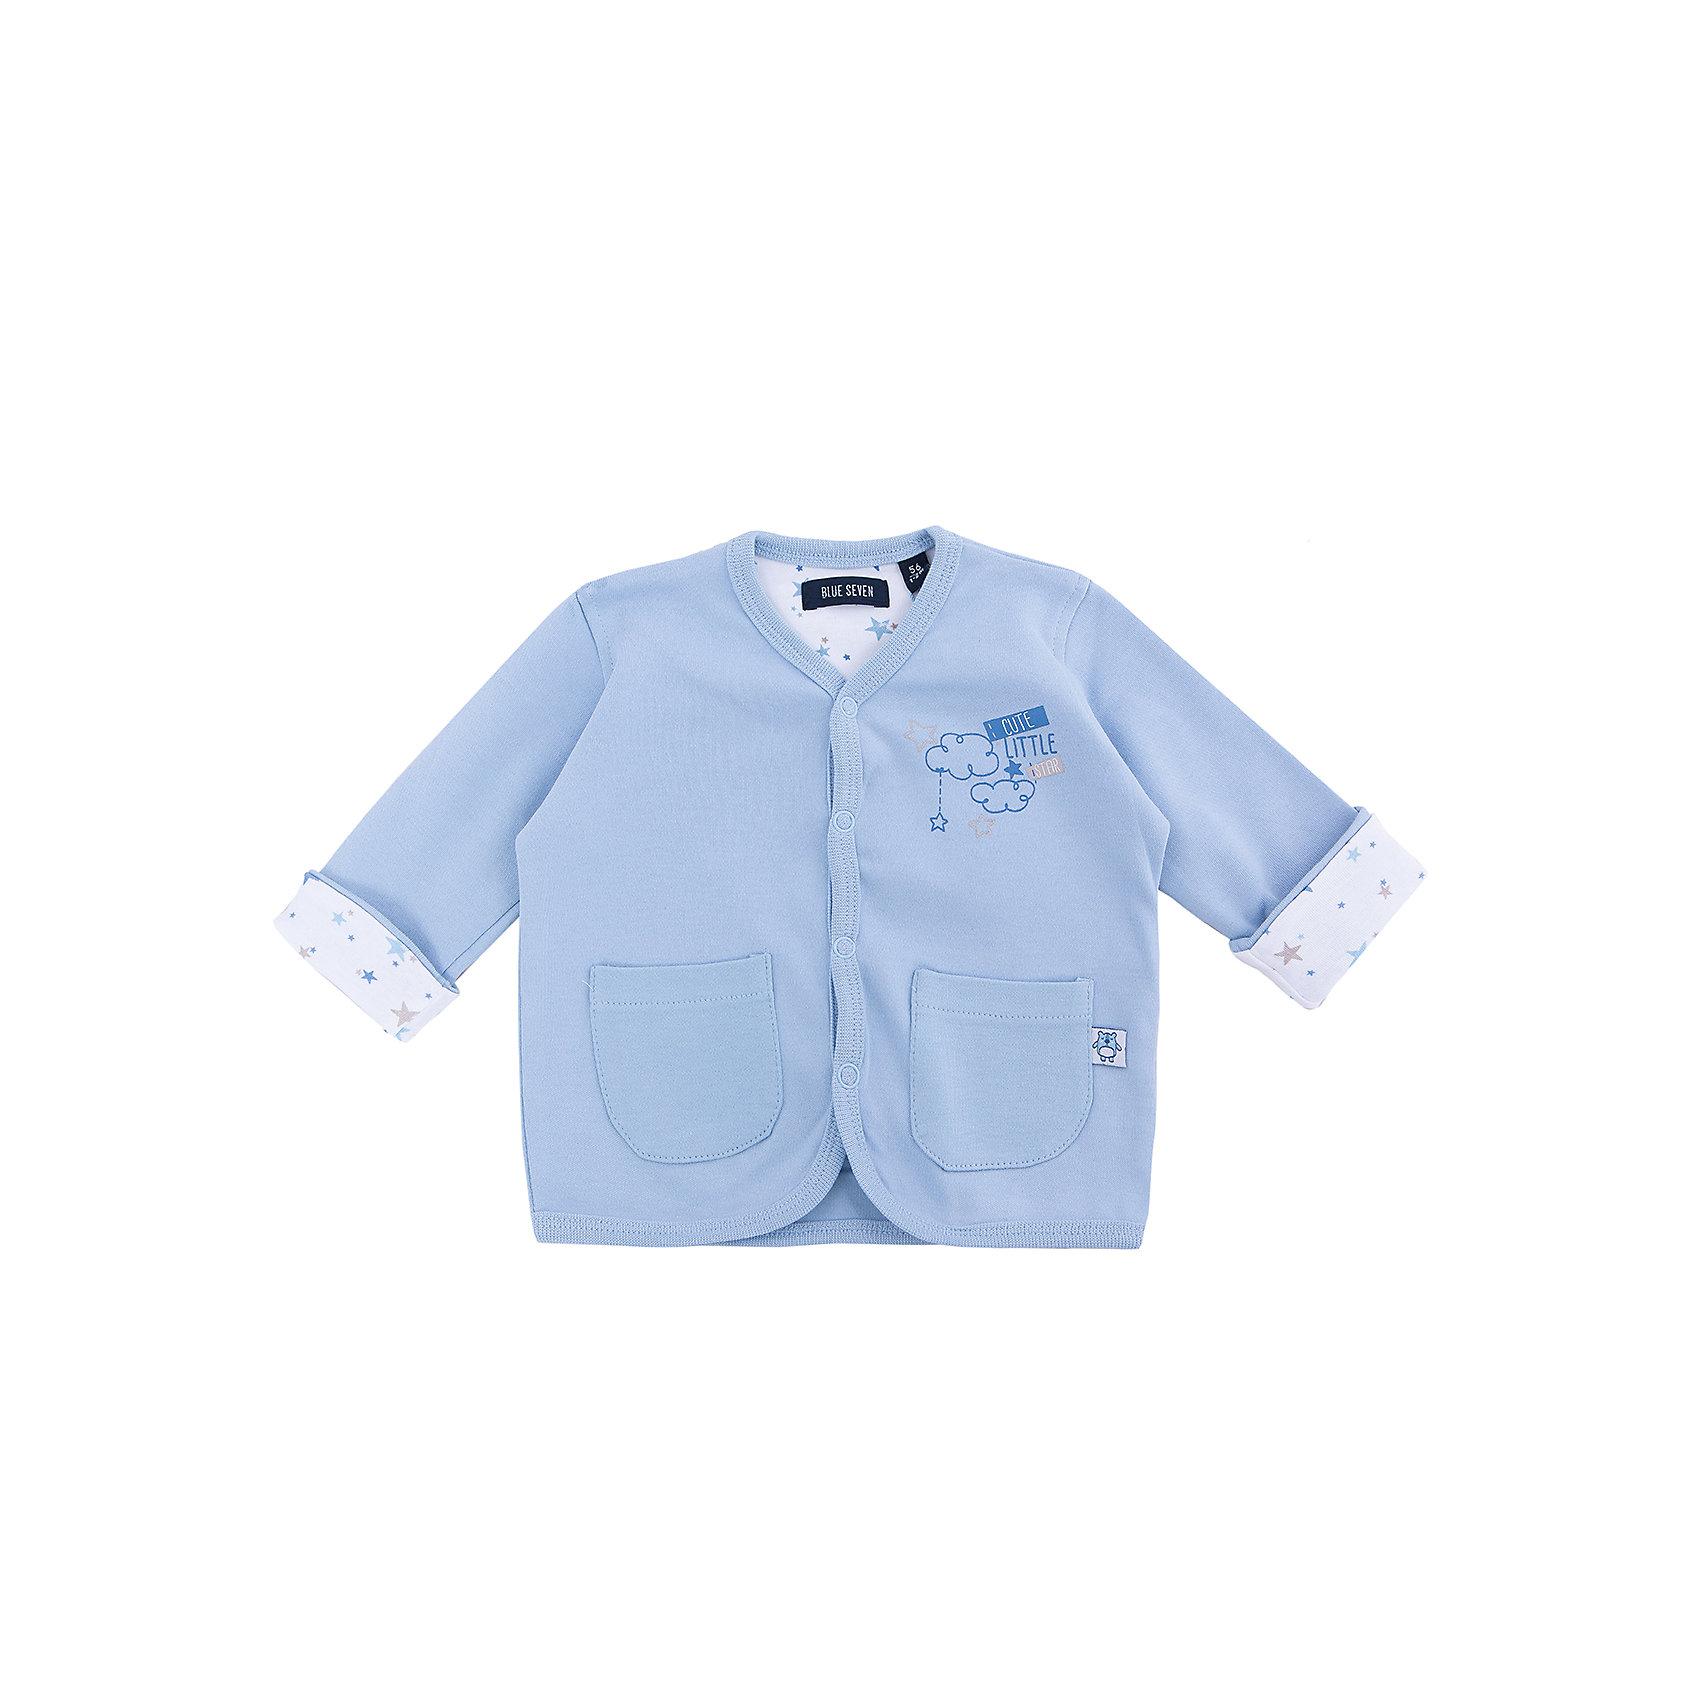 Кофта для мальчика BLUE SEVENКофта для мальчика от известного бренда Blue Seven. Состав: 100% хлопок<br><br>Ширина мм: 190<br>Глубина мм: 74<br>Высота мм: 229<br>Вес г: 236<br>Цвет: голубой<br>Возраст от месяцев: 3<br>Возраст до месяцев: 6<br>Пол: Мужской<br>Возраст: Детский<br>Размер: 68,56,62<br>SKU: 4054536